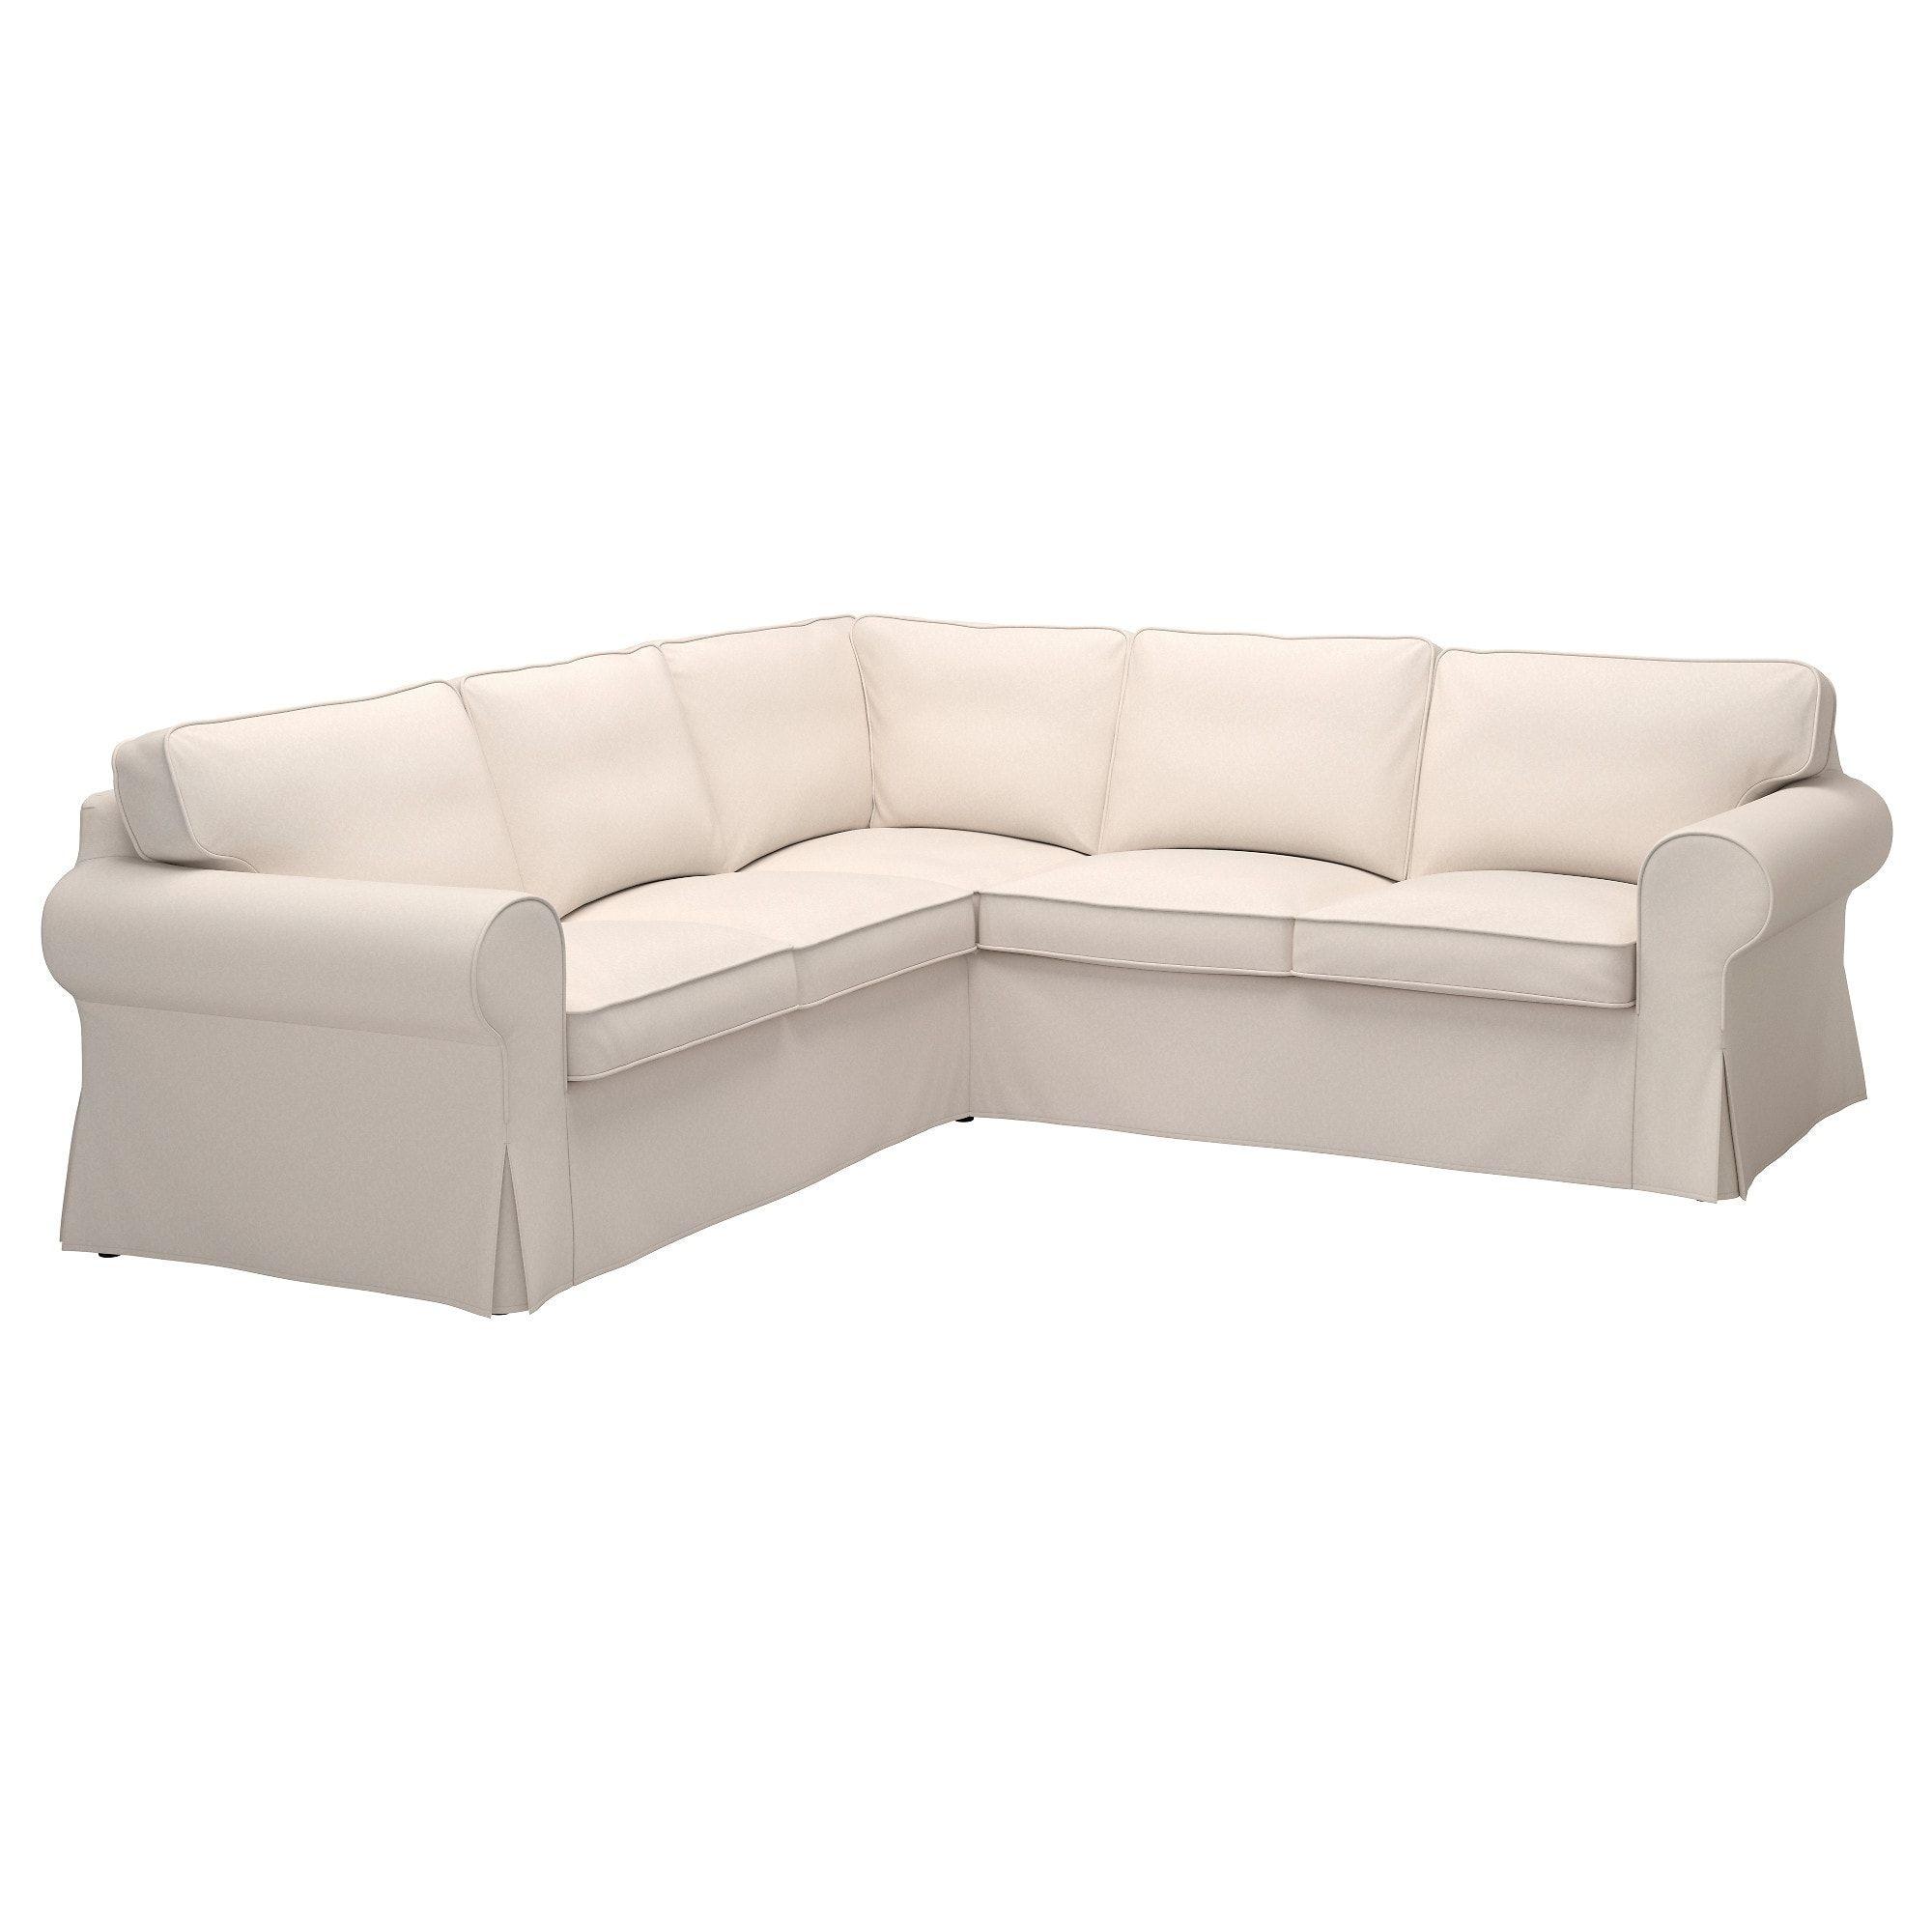 Ektorp Sectional 4 Seat Corner Lofallet Beige With Images Ektorp Sectional Ikea Ektorp Sectional Ikea Sectional